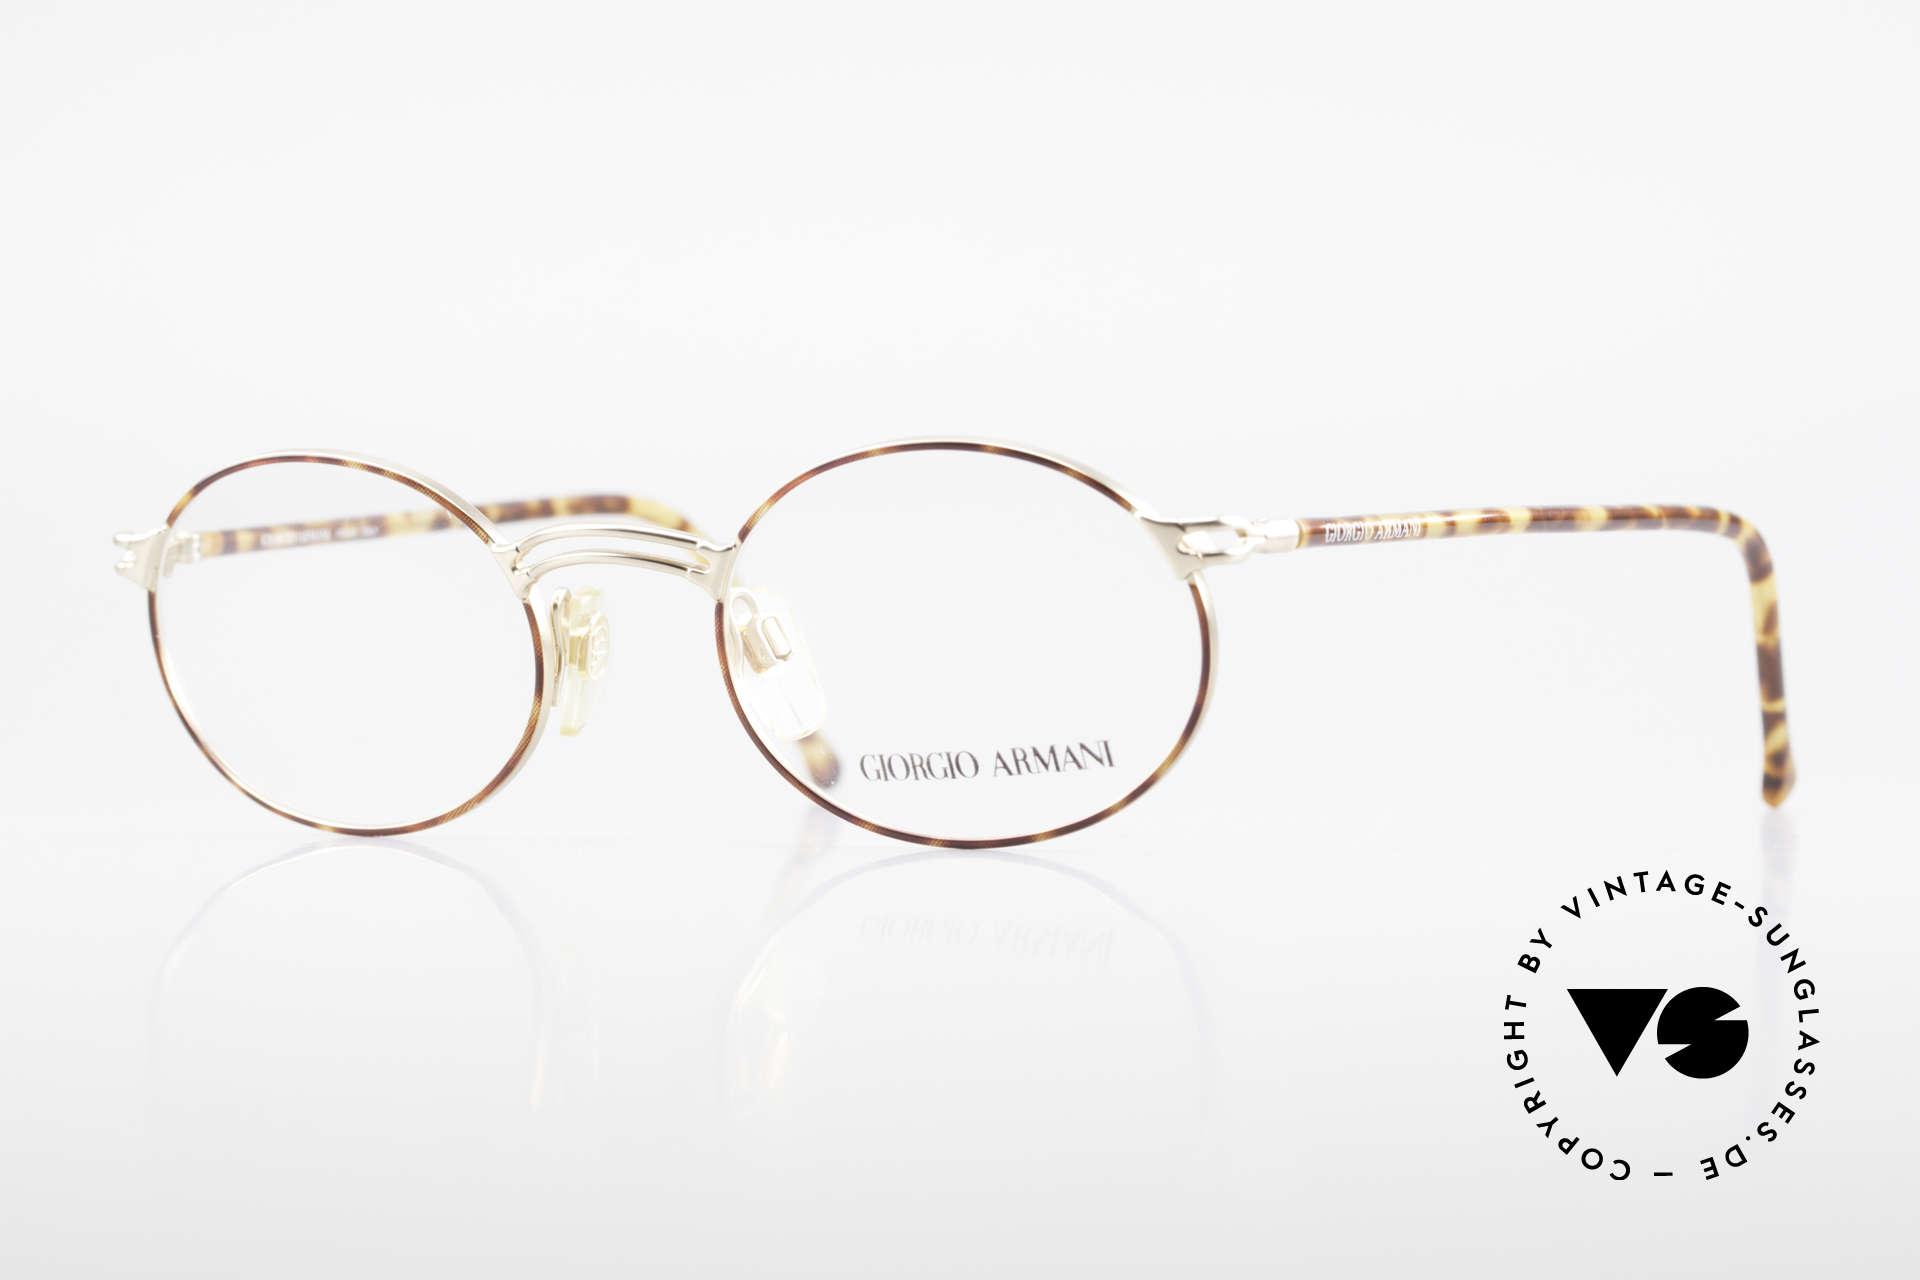 Giorgio Armani 194 Oval 90s Eyeglasses No Retro, vintage designer eyeglasses by Giorgio Armani, Italy, Made for Men and Women